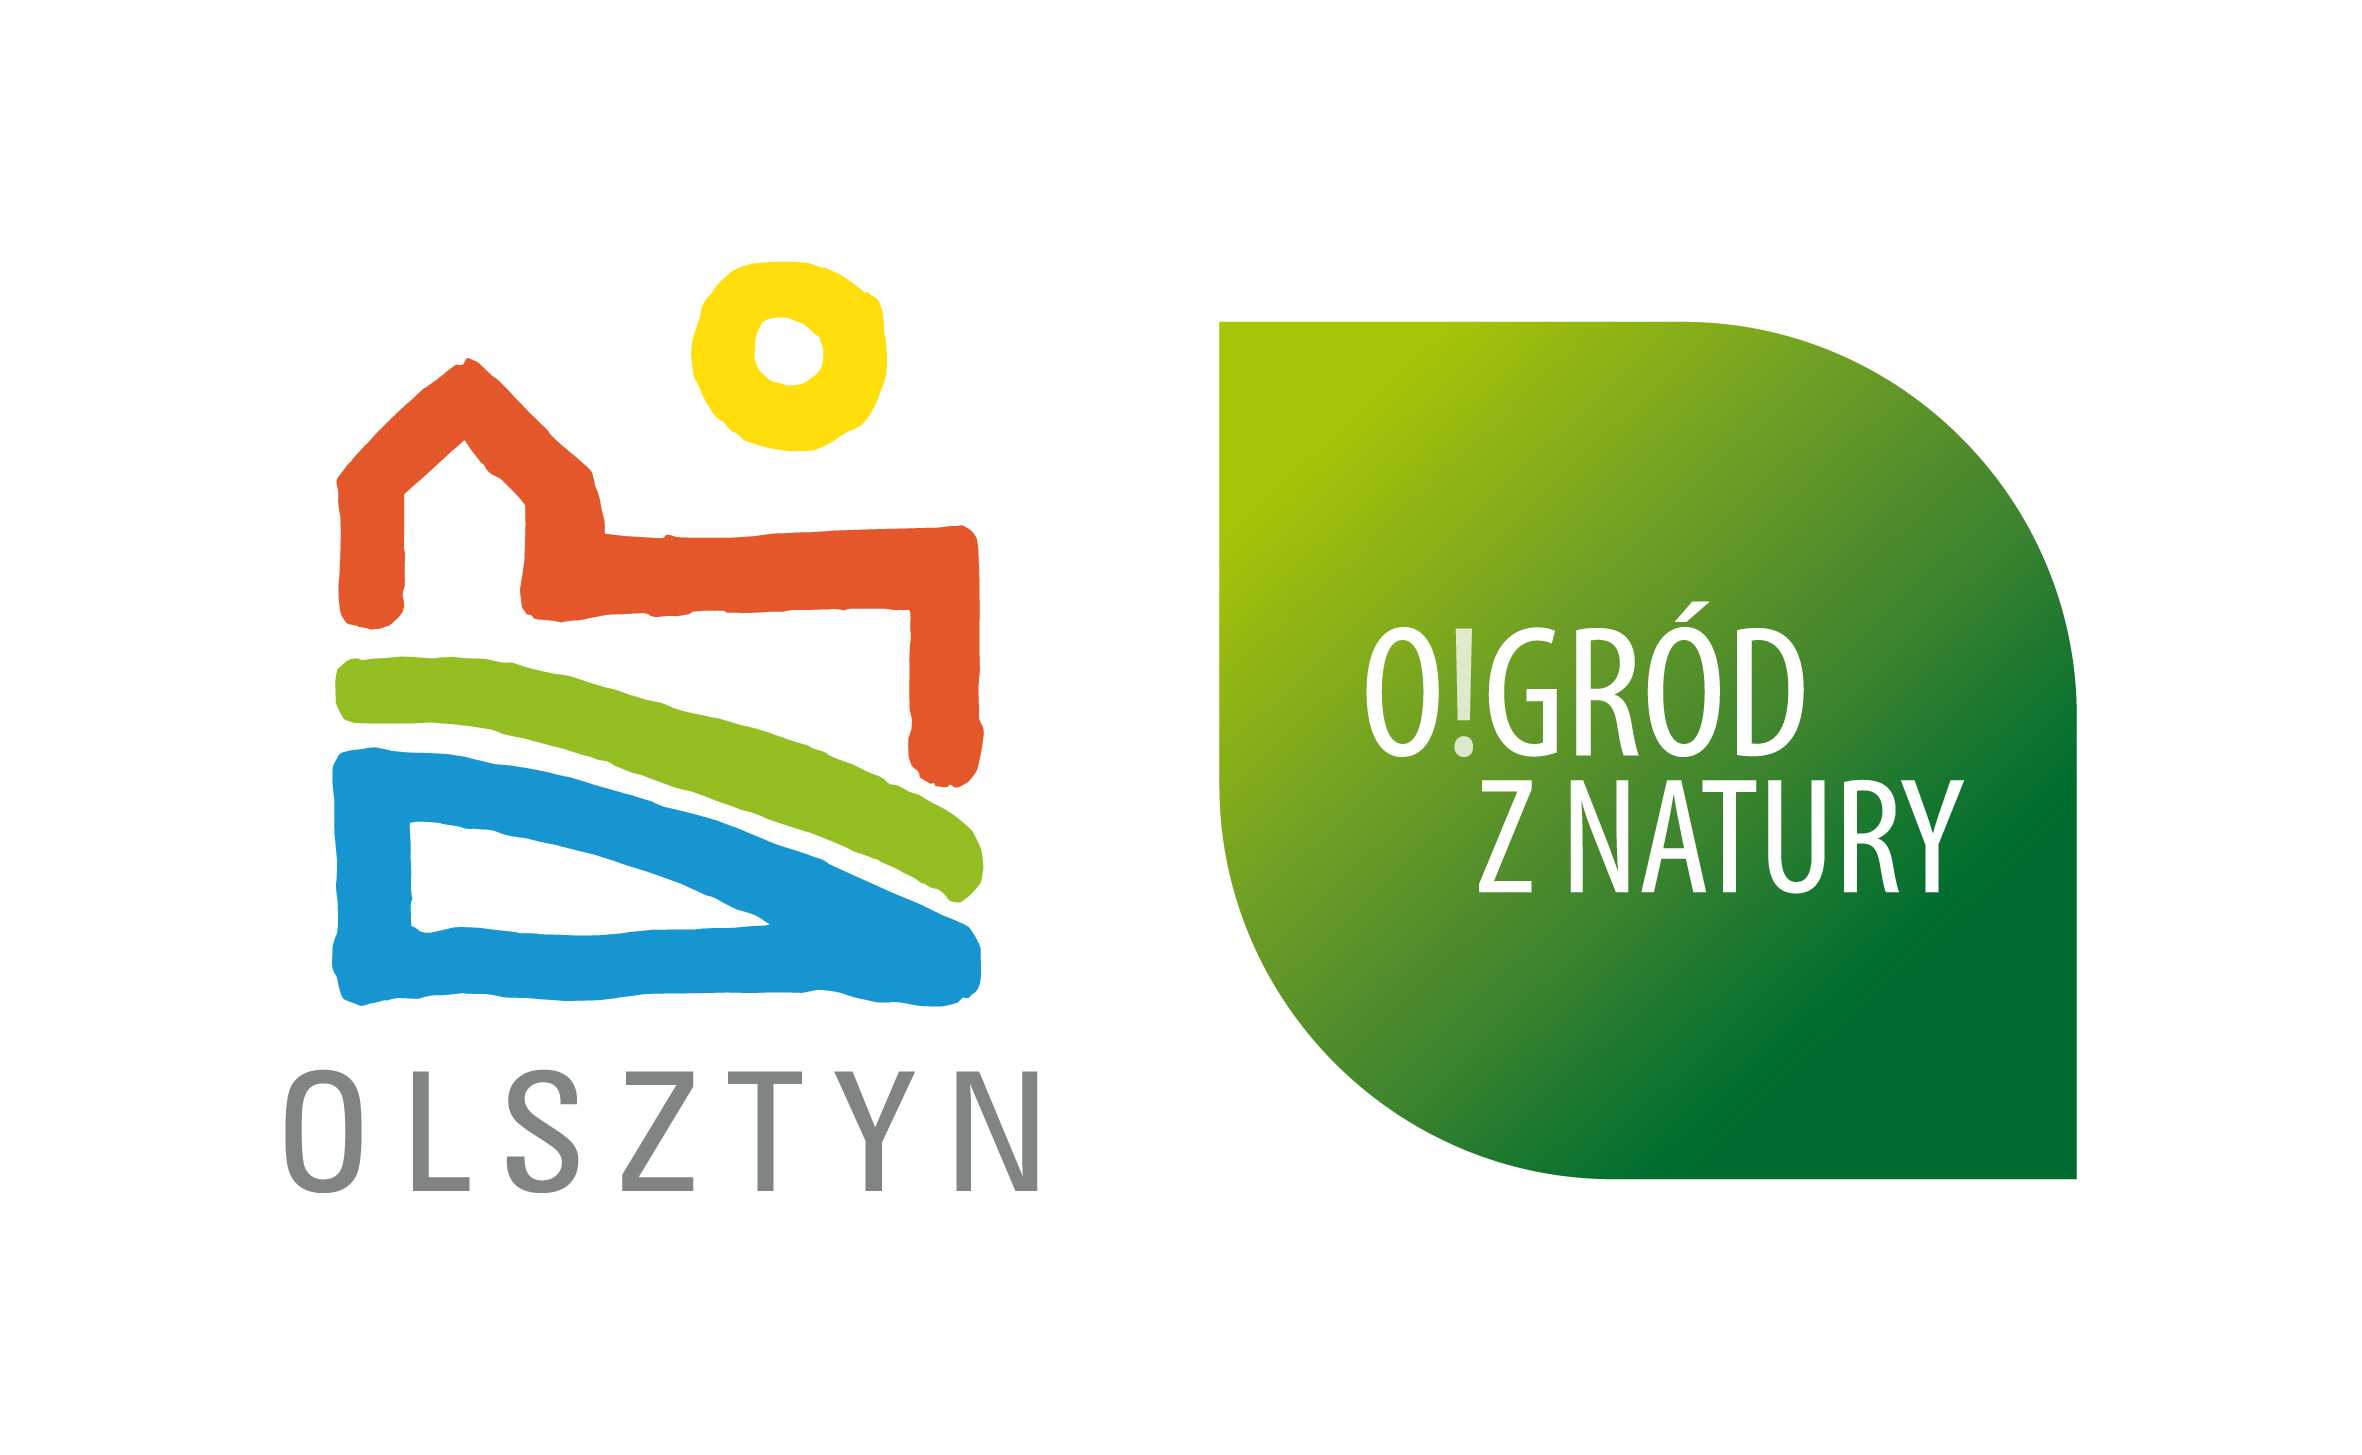 http://m.wmwm.pl/2017/10/orig/logo-z-listkiem-5884.jpg